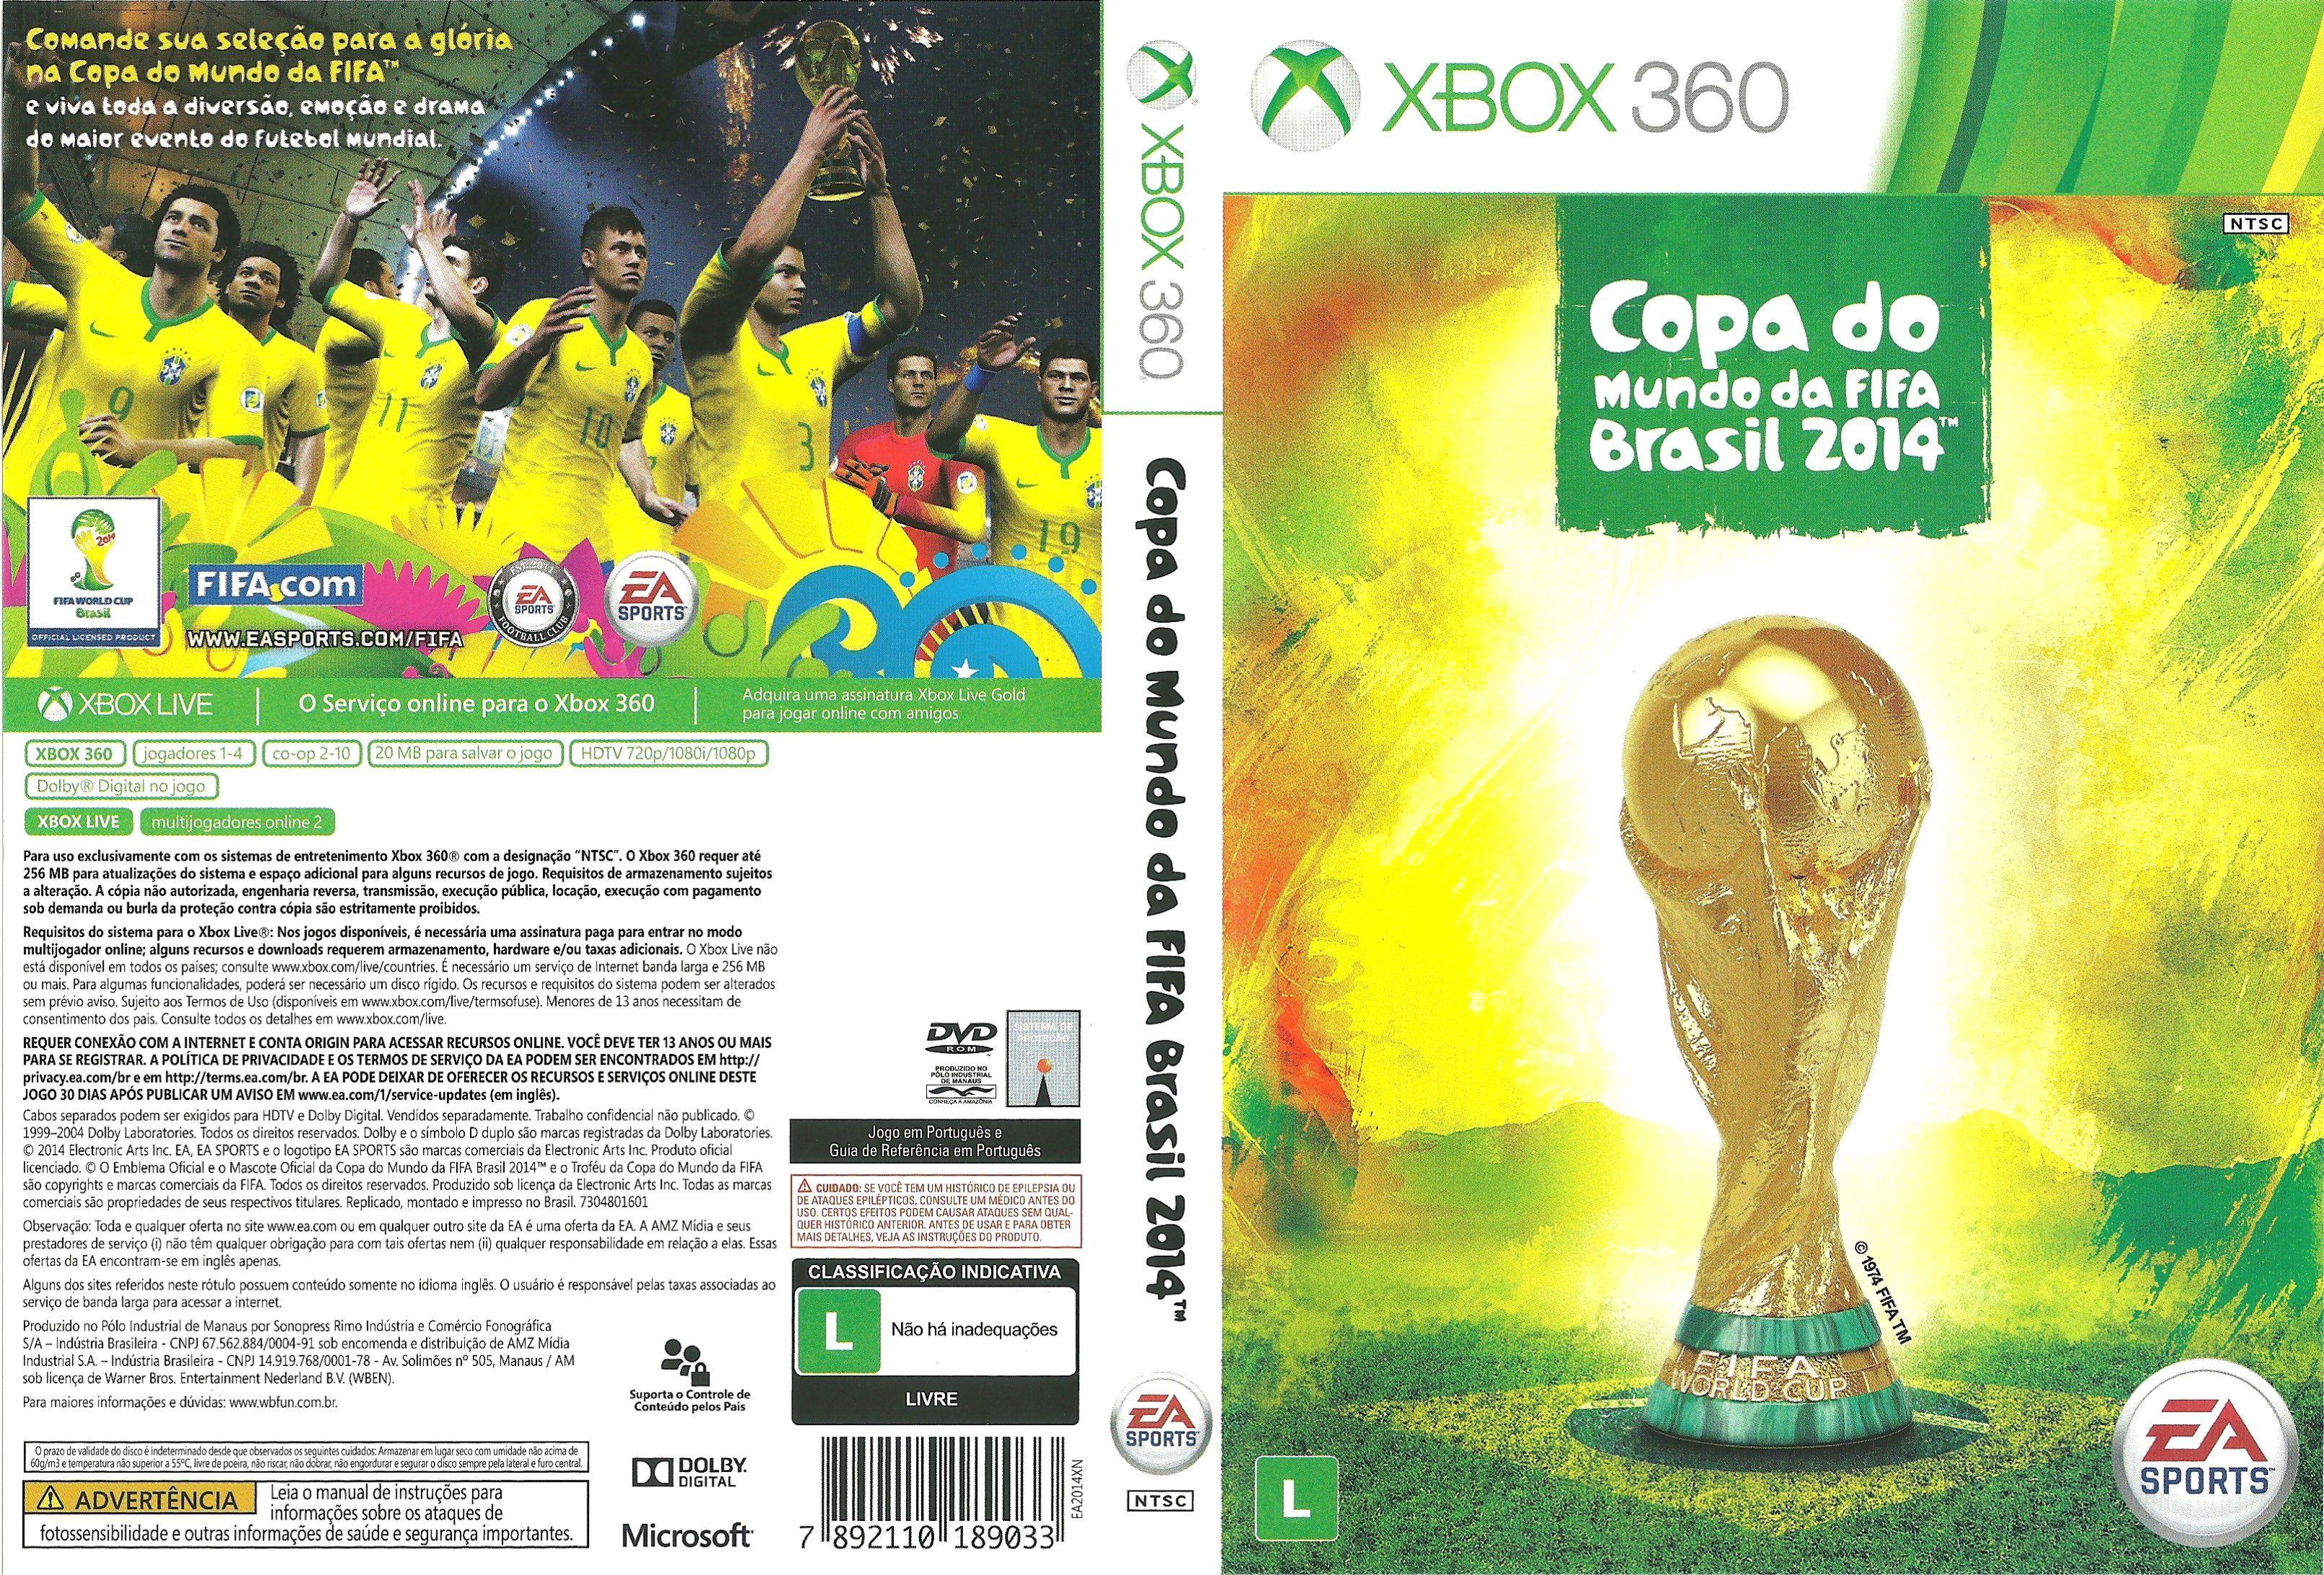 Capa Copa Do Mundo Da Fifa Brasil 2014 Xbox 360